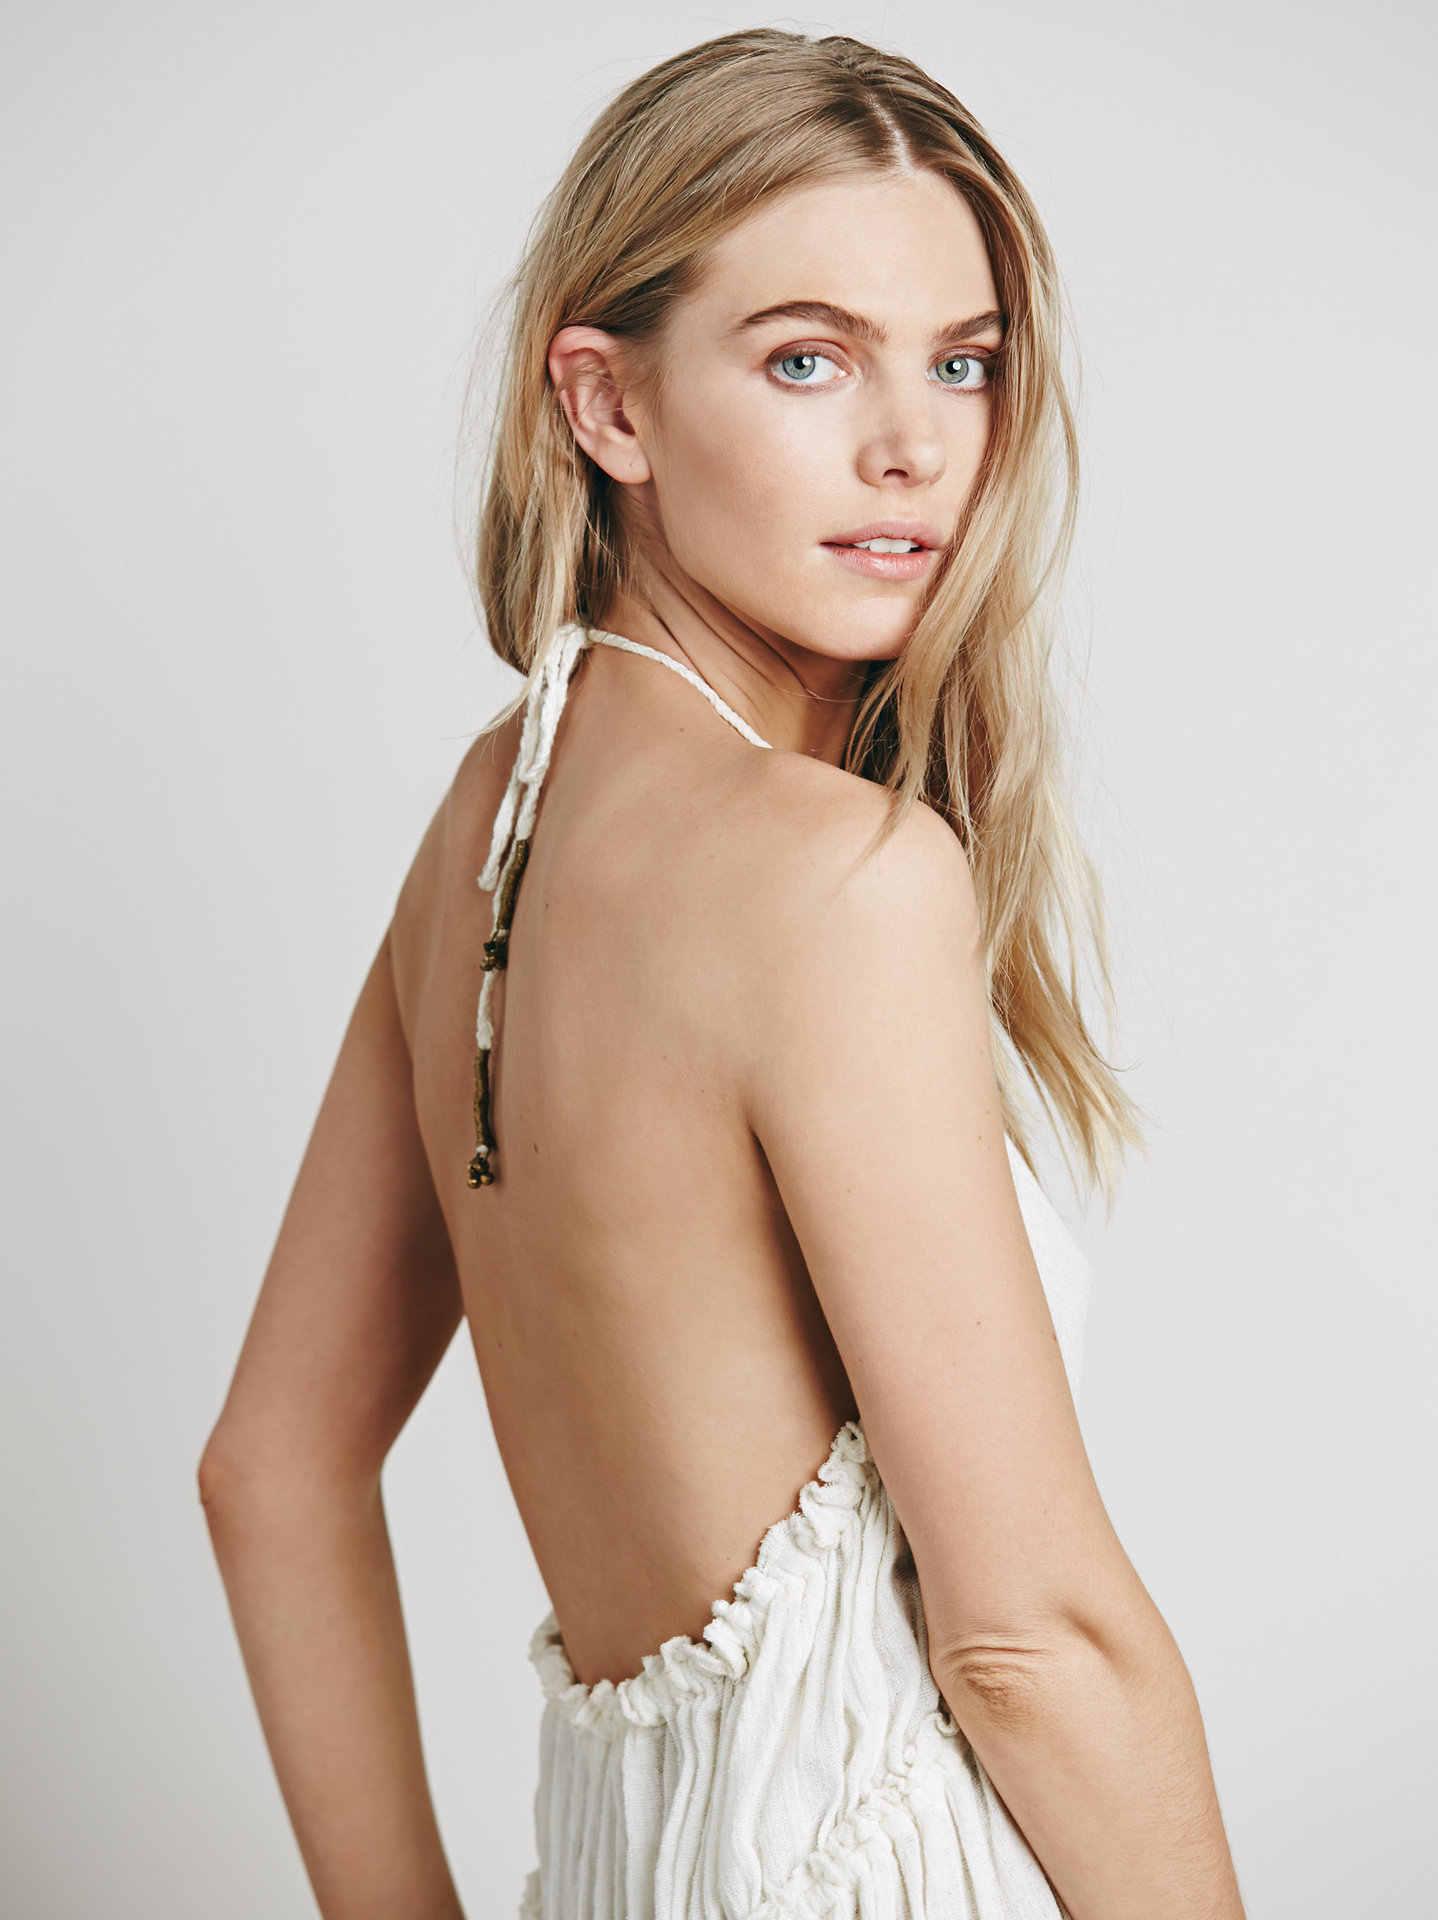 a6ad84994d7d8 2018 free shipping hot Greek hobe style backless Dress Sexy off-shoulder  V-neck strap dresses people's women elegant dresses